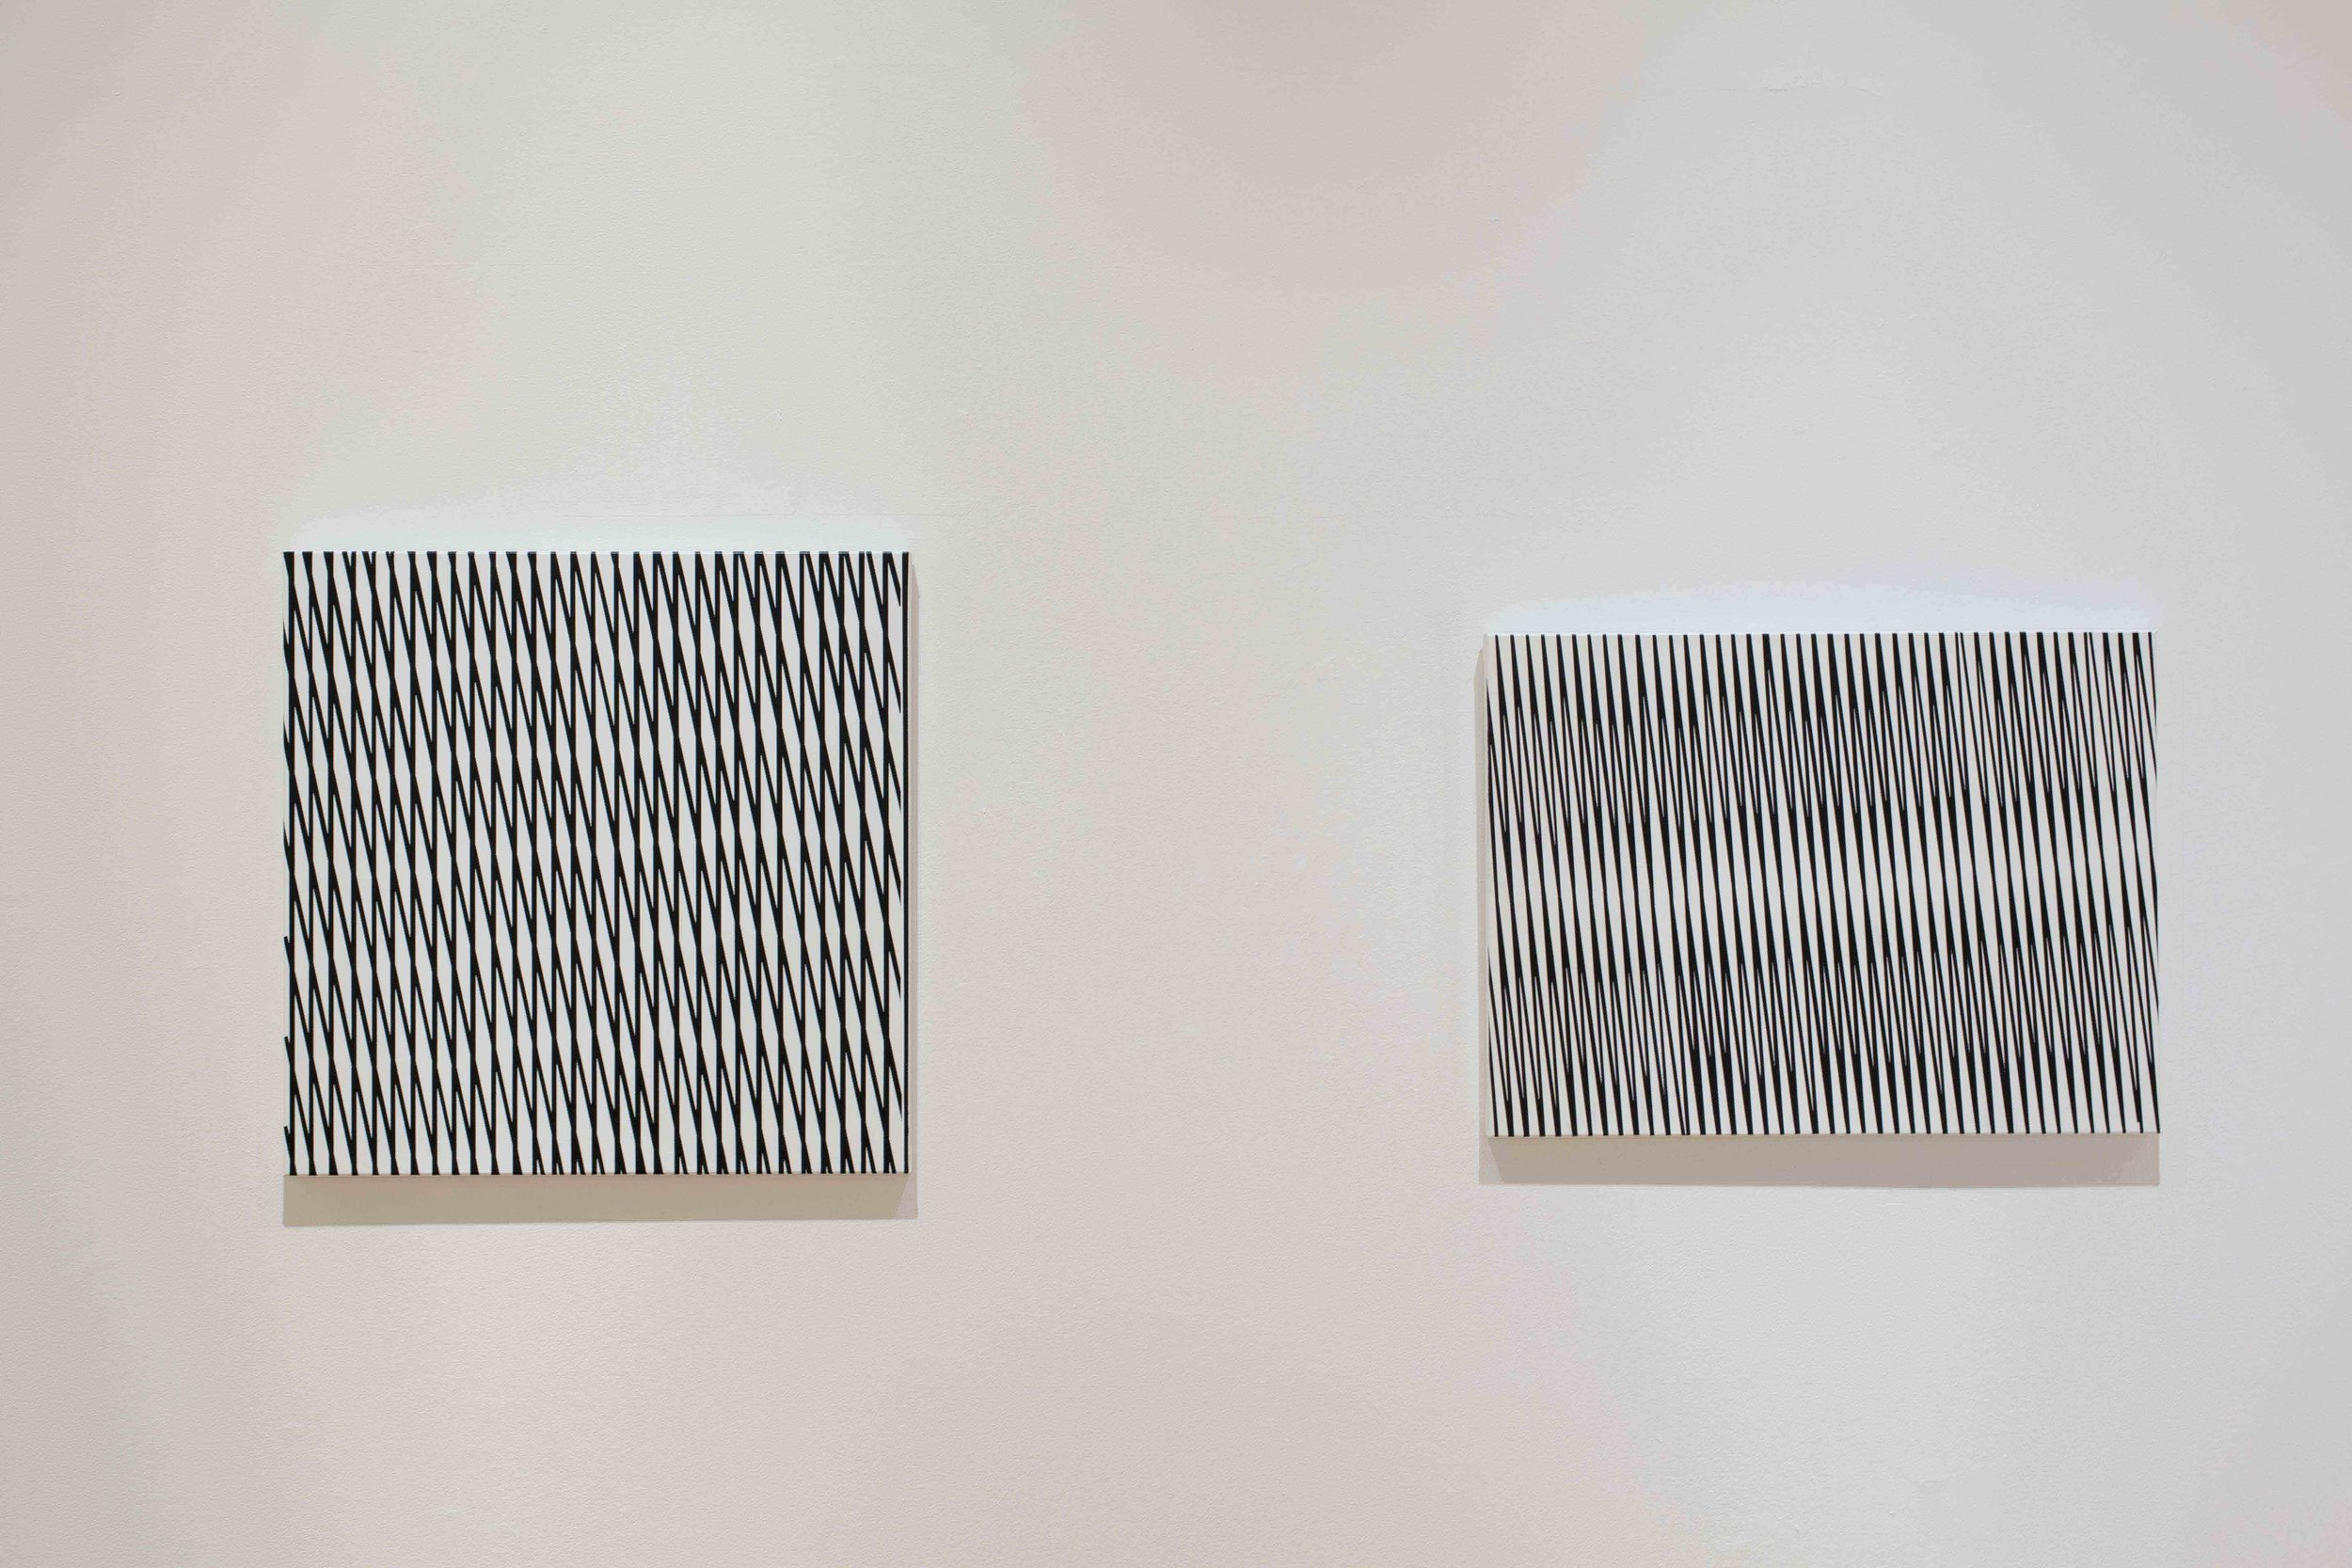 NIKE SAVVAS   Sliding weave (hold)  2012 acrylic on canvas 74 x 74 cm  Sliding weave (lawless)  2012 acrylic on canvas 60 x 80cm